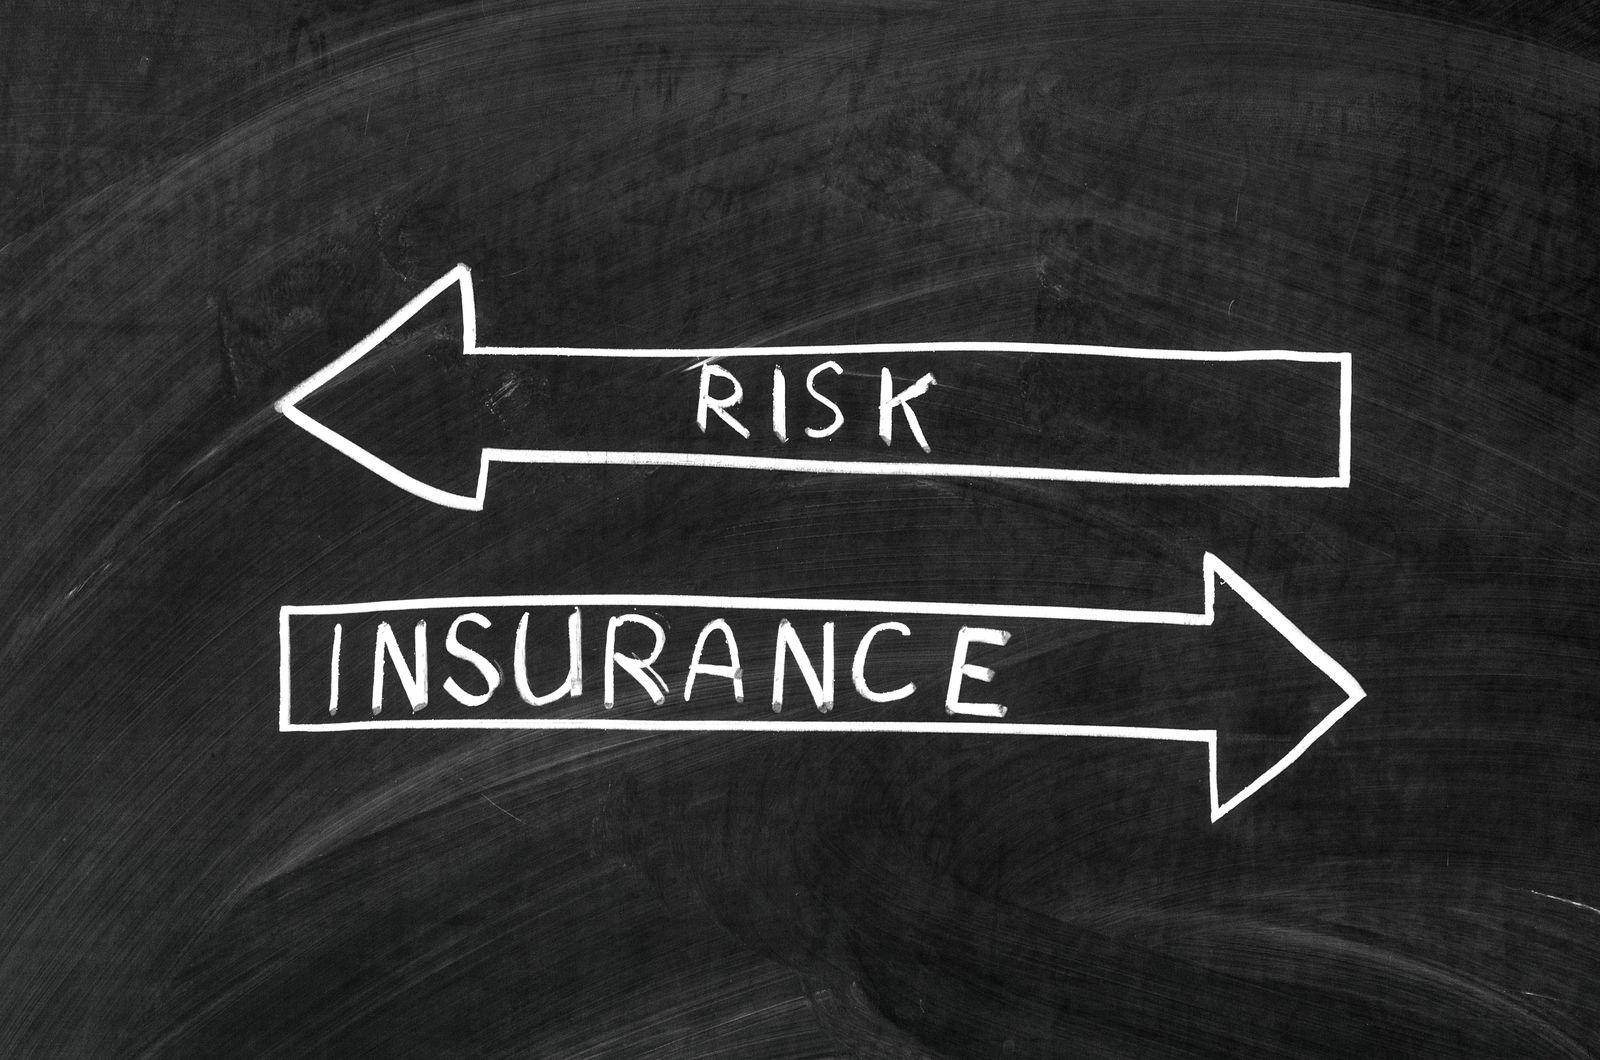 Where can I find non-standard car insurance?